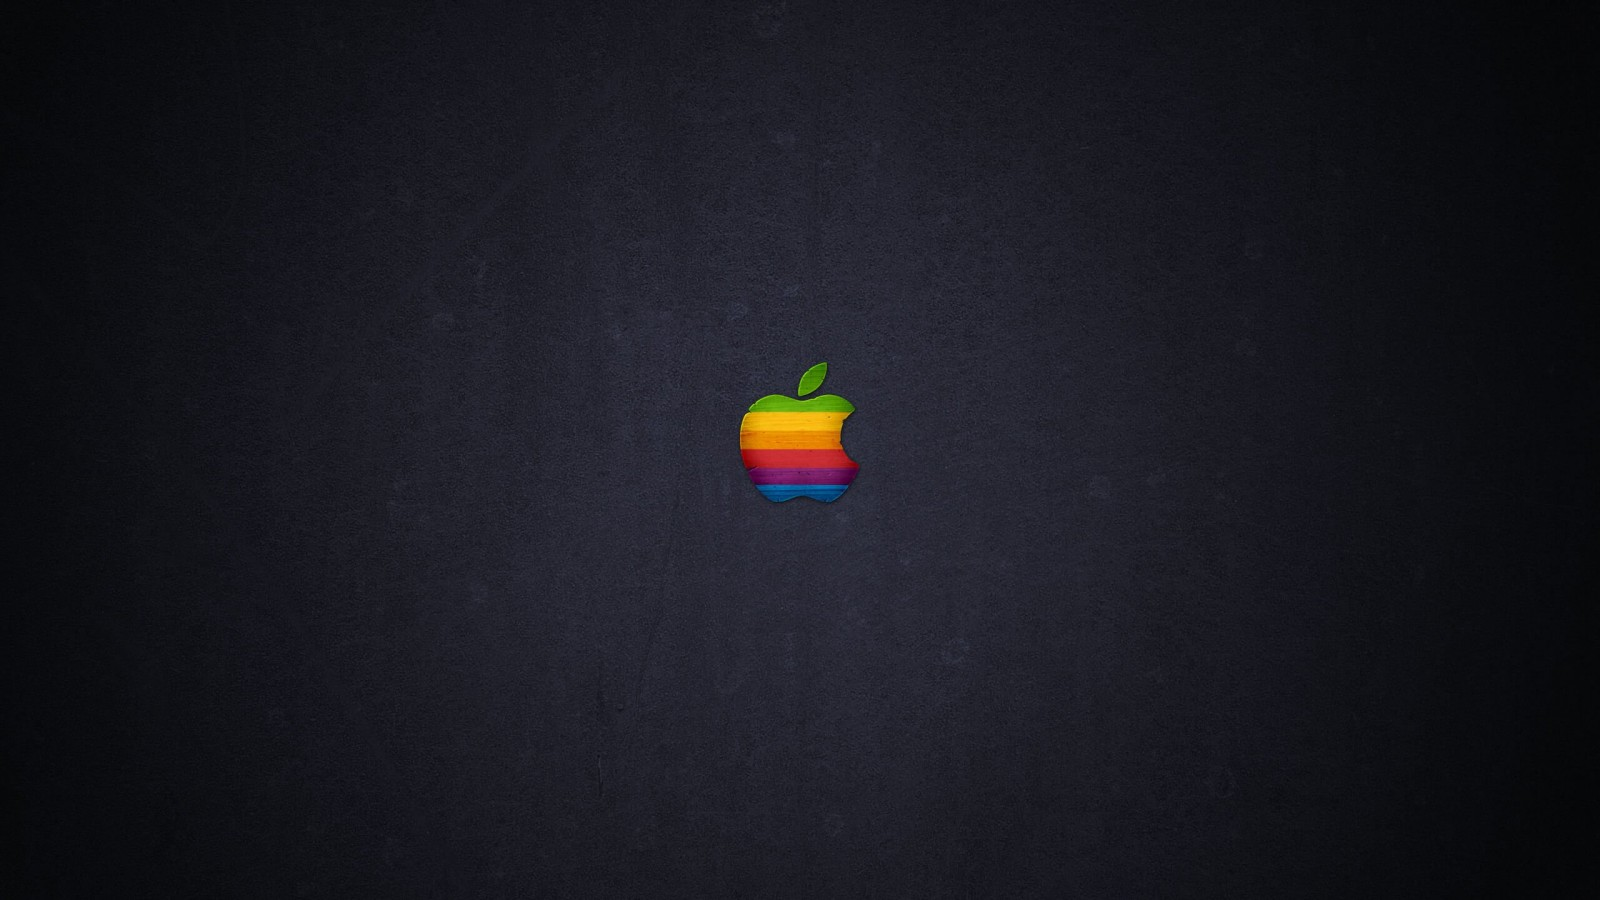 Wood Retro Apple HD wallpaper for 1600x900 screens